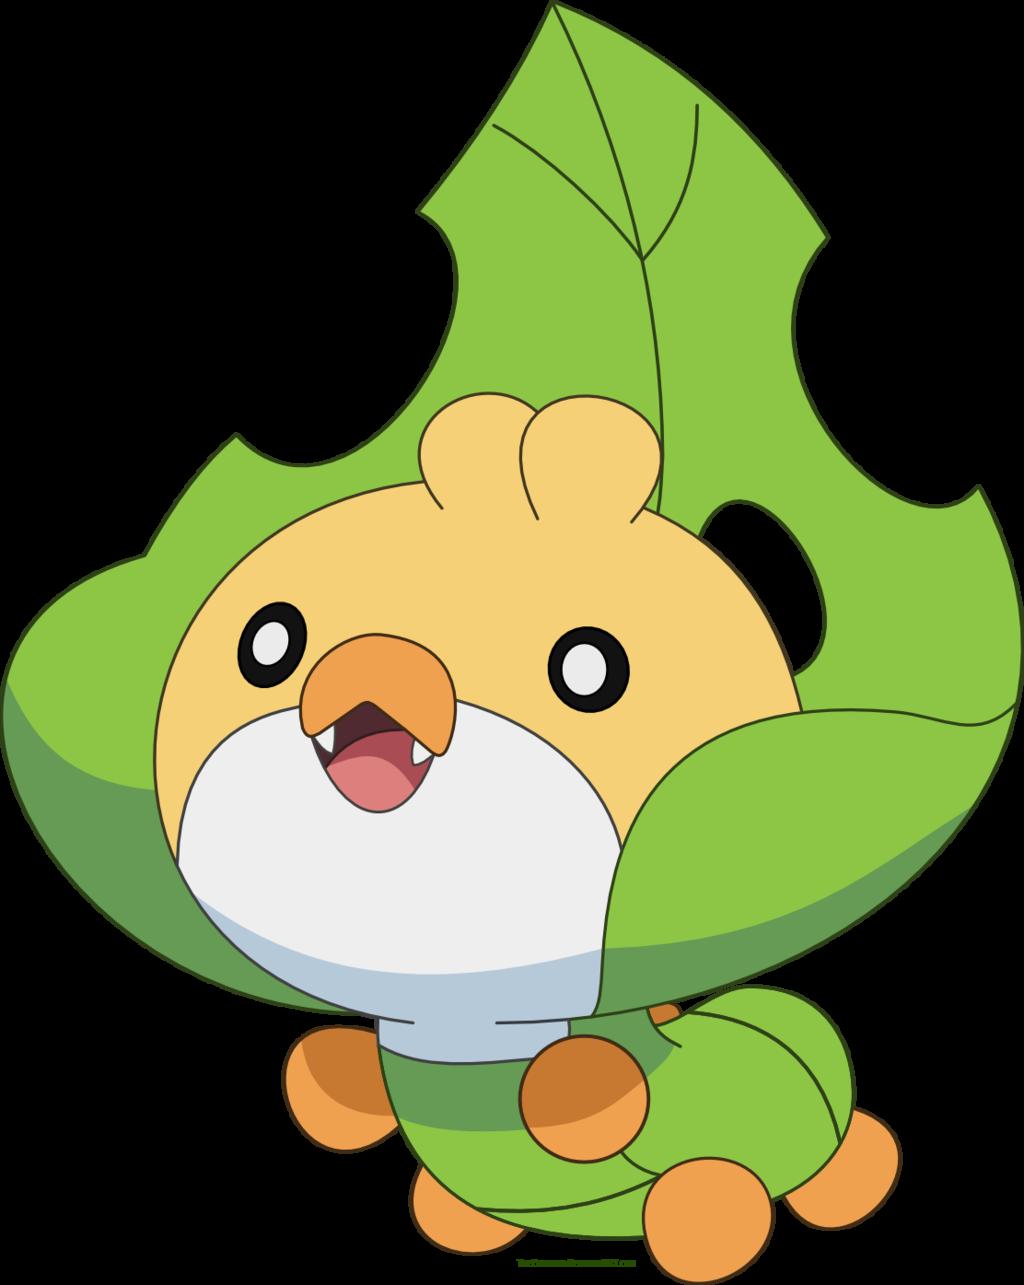 Free Sewaddle Pokemon vector by Emerald.